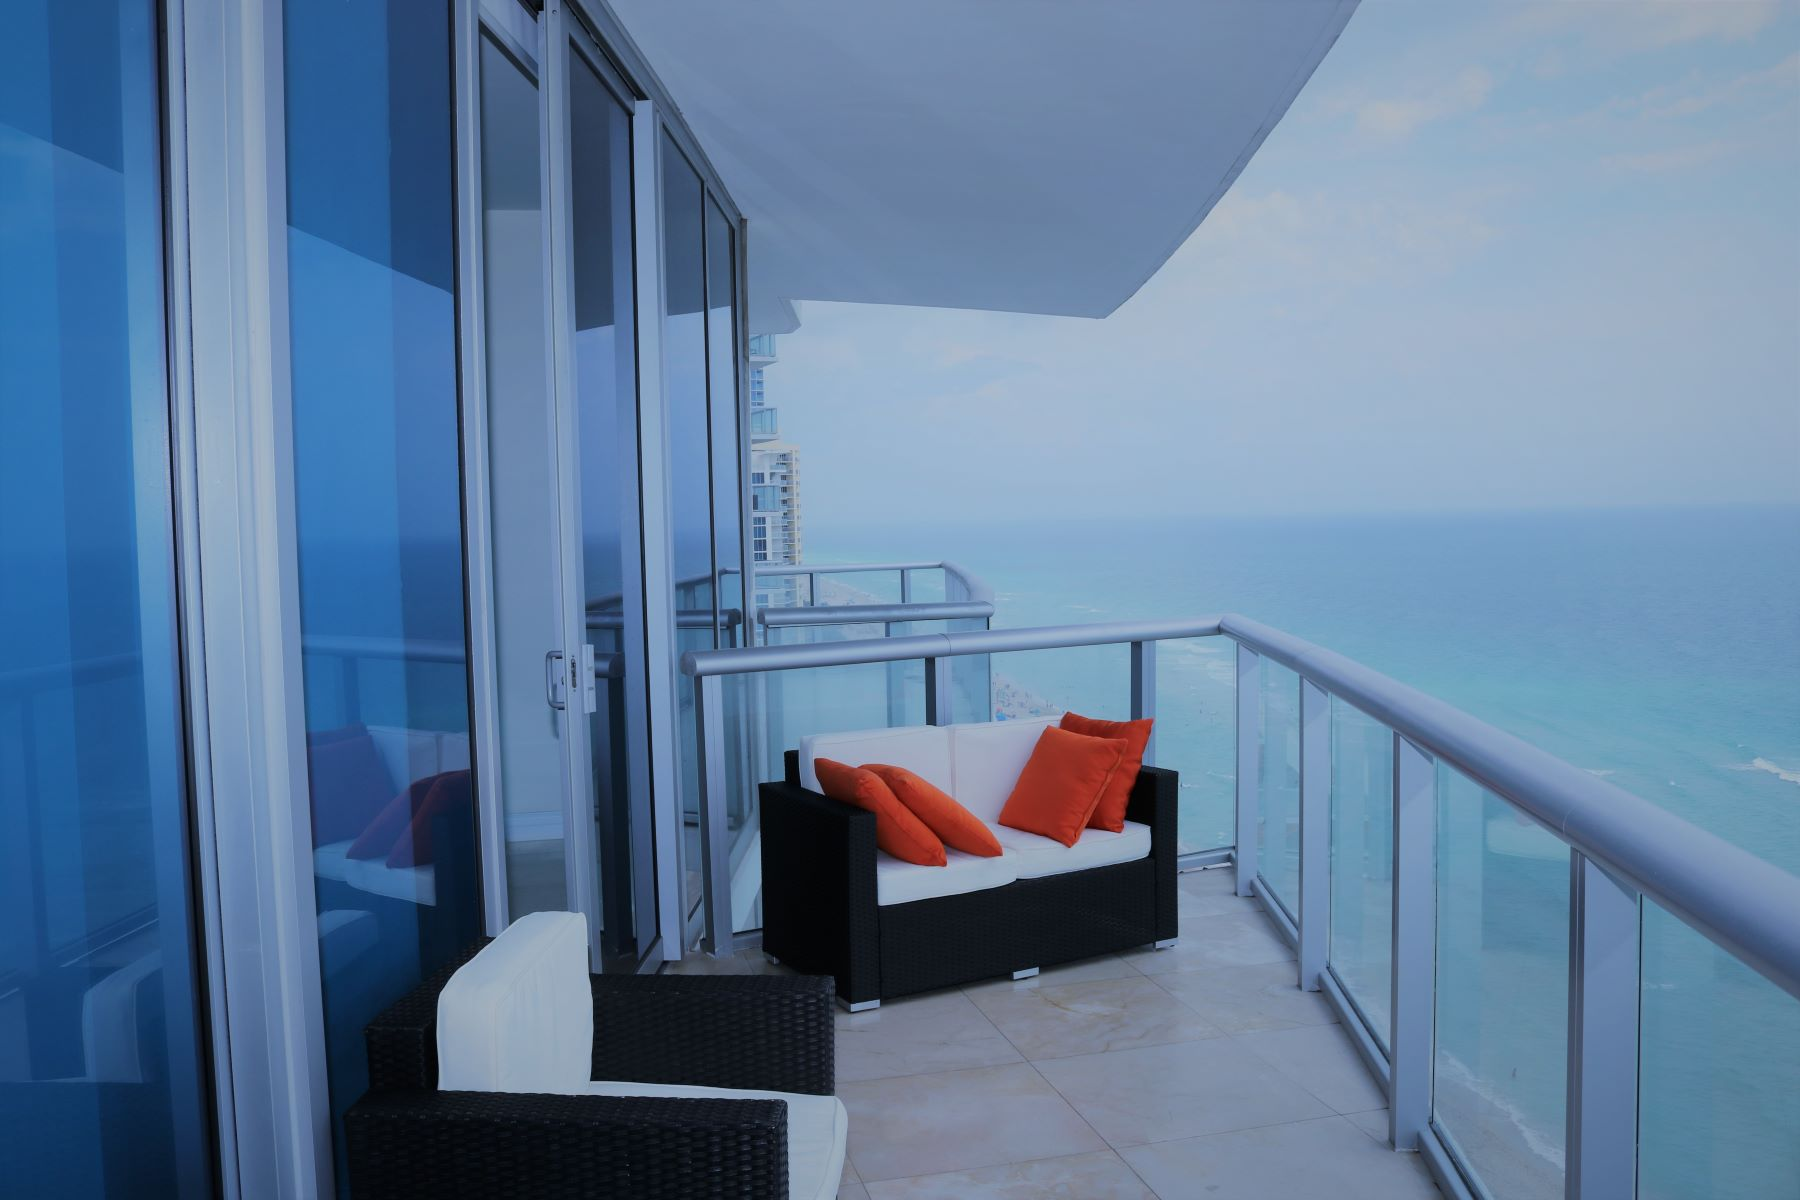 شقة بعمارة للـ Rent في 17001 Collins Ave 17001 Collins Ave 2106, Sunny Isles Beach, Florida, 33160 United States